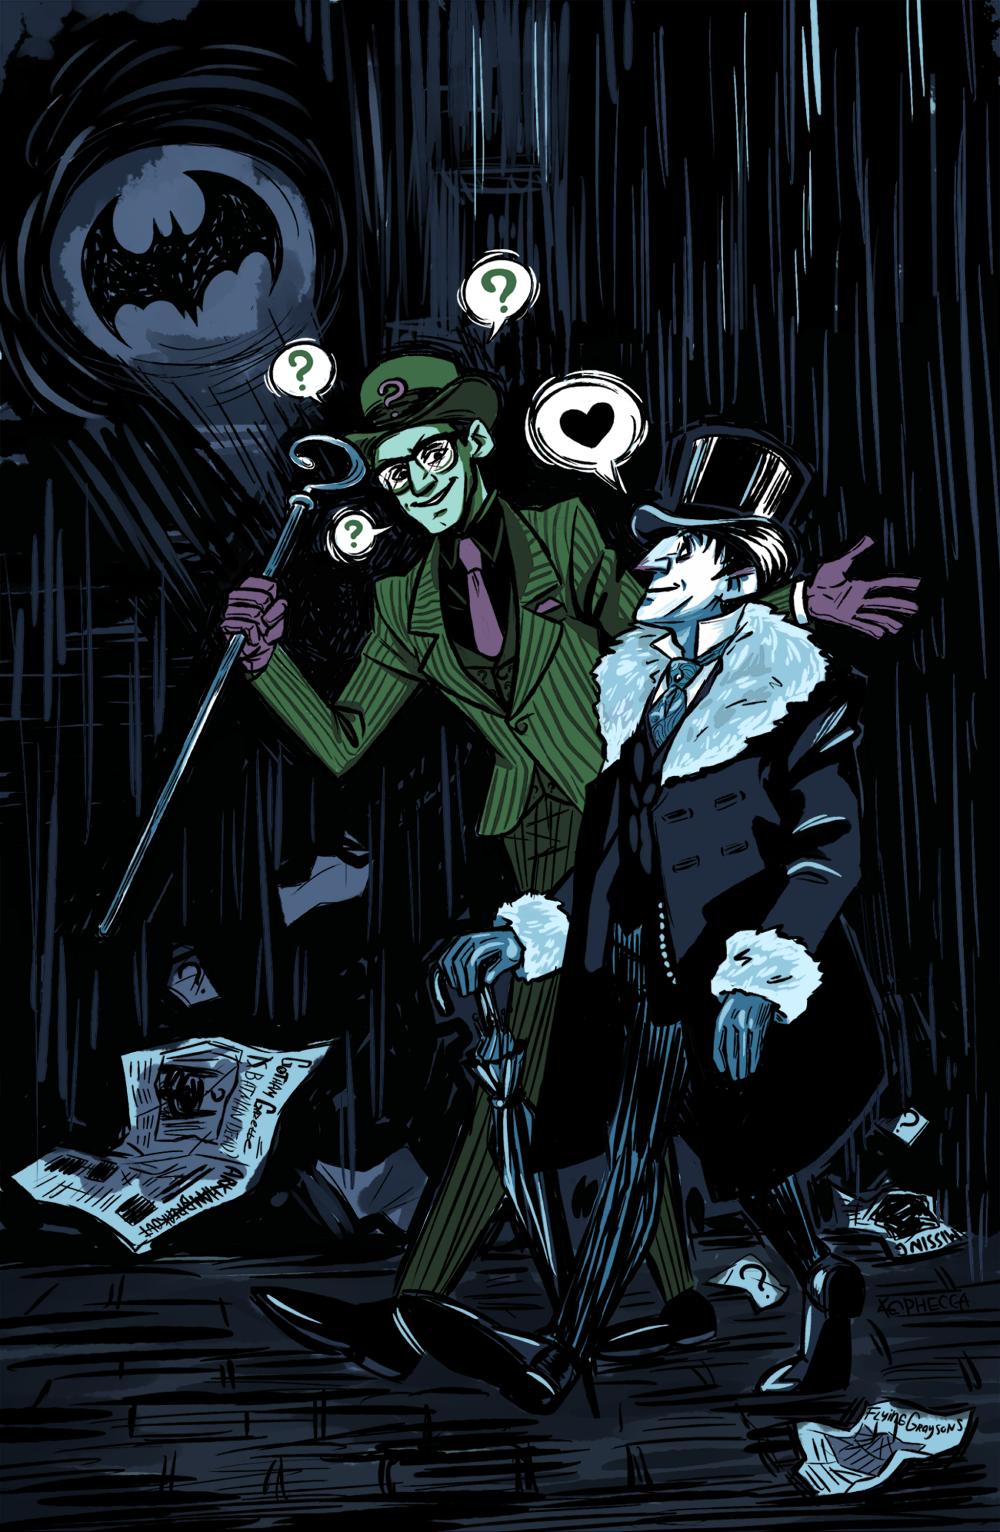 I Love Dc Comics : I love nygmobblepot dc comics gotham riddler city